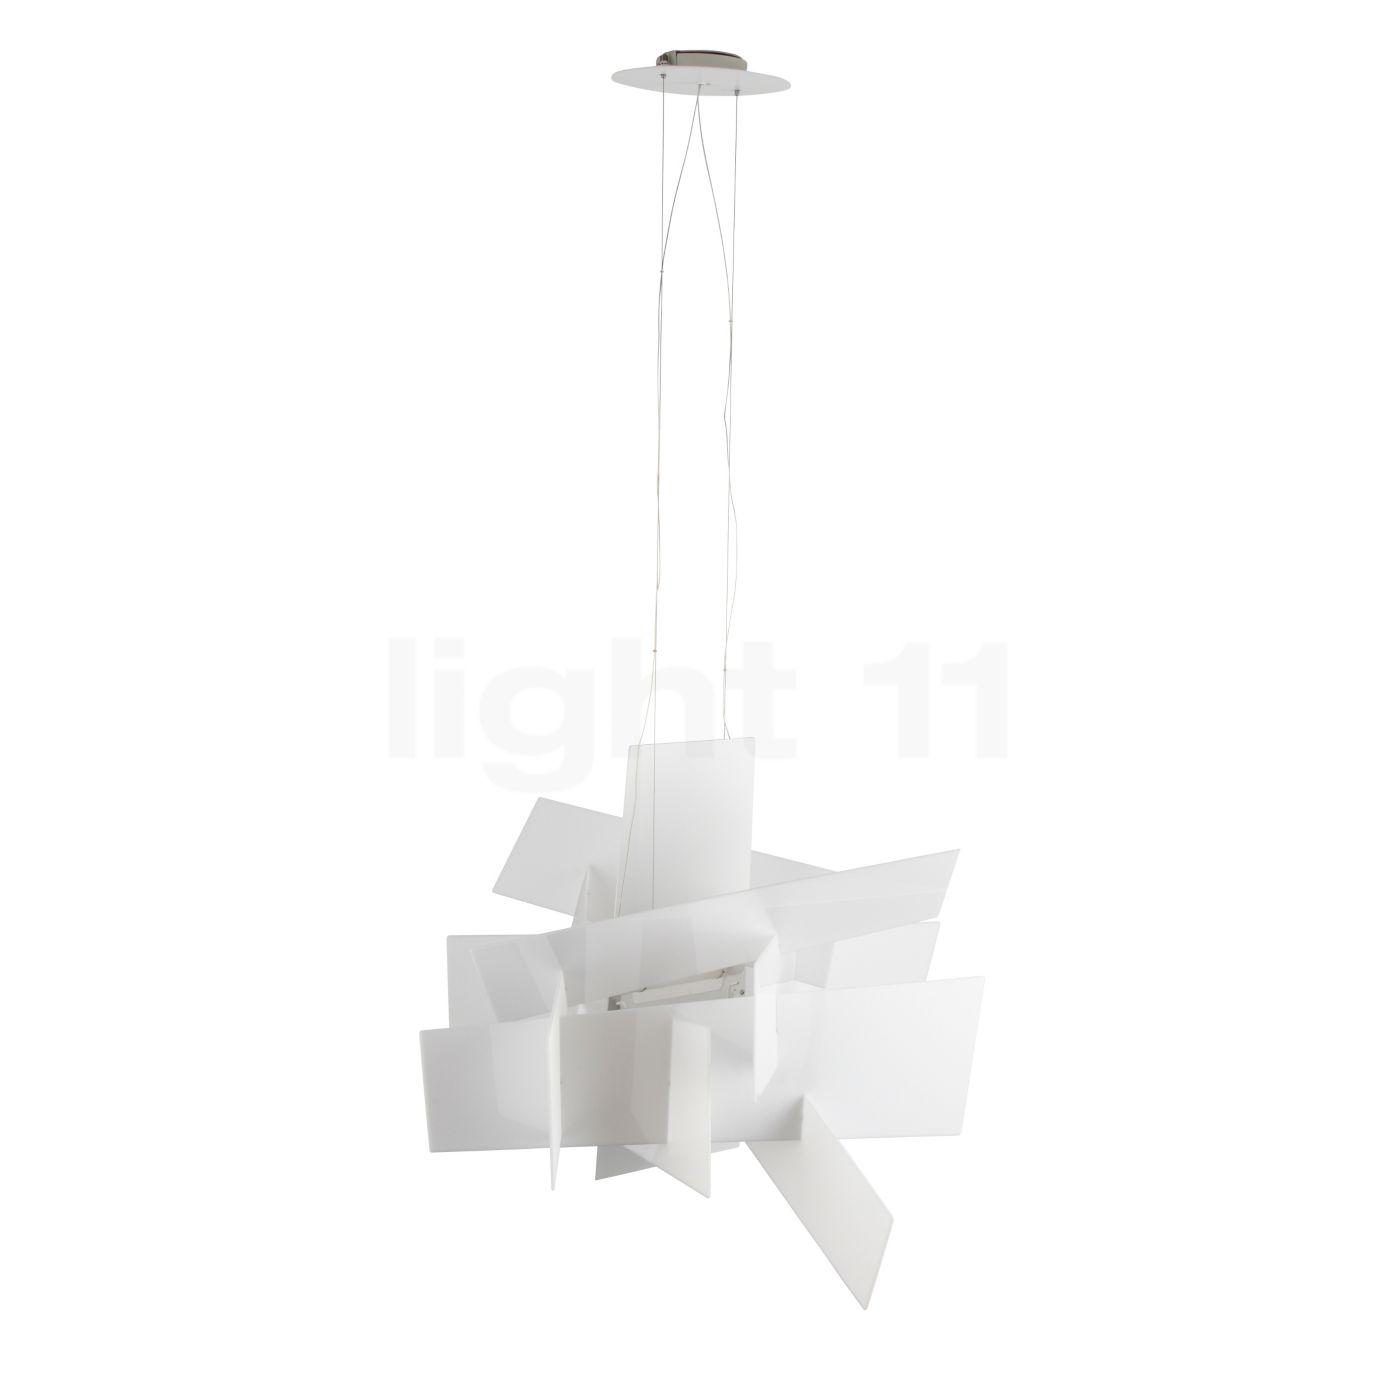 Foscarini Big Bang Sospensione kaufen bei light11.de